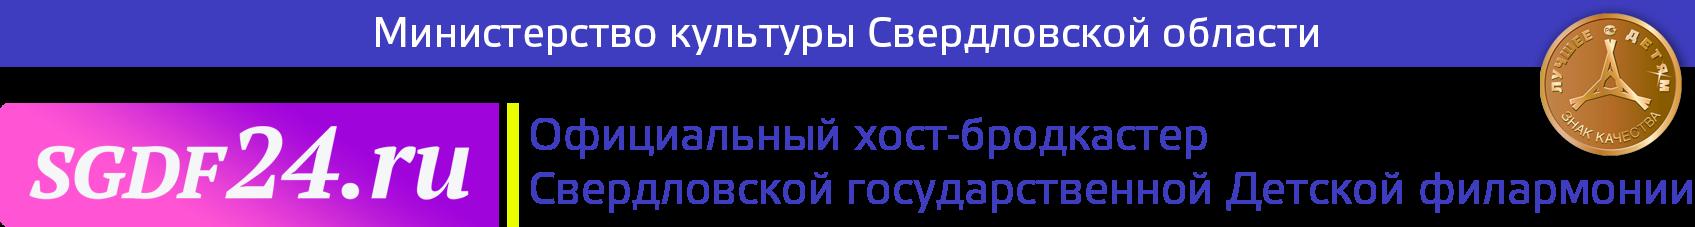 Телеканал SGDF24.RU